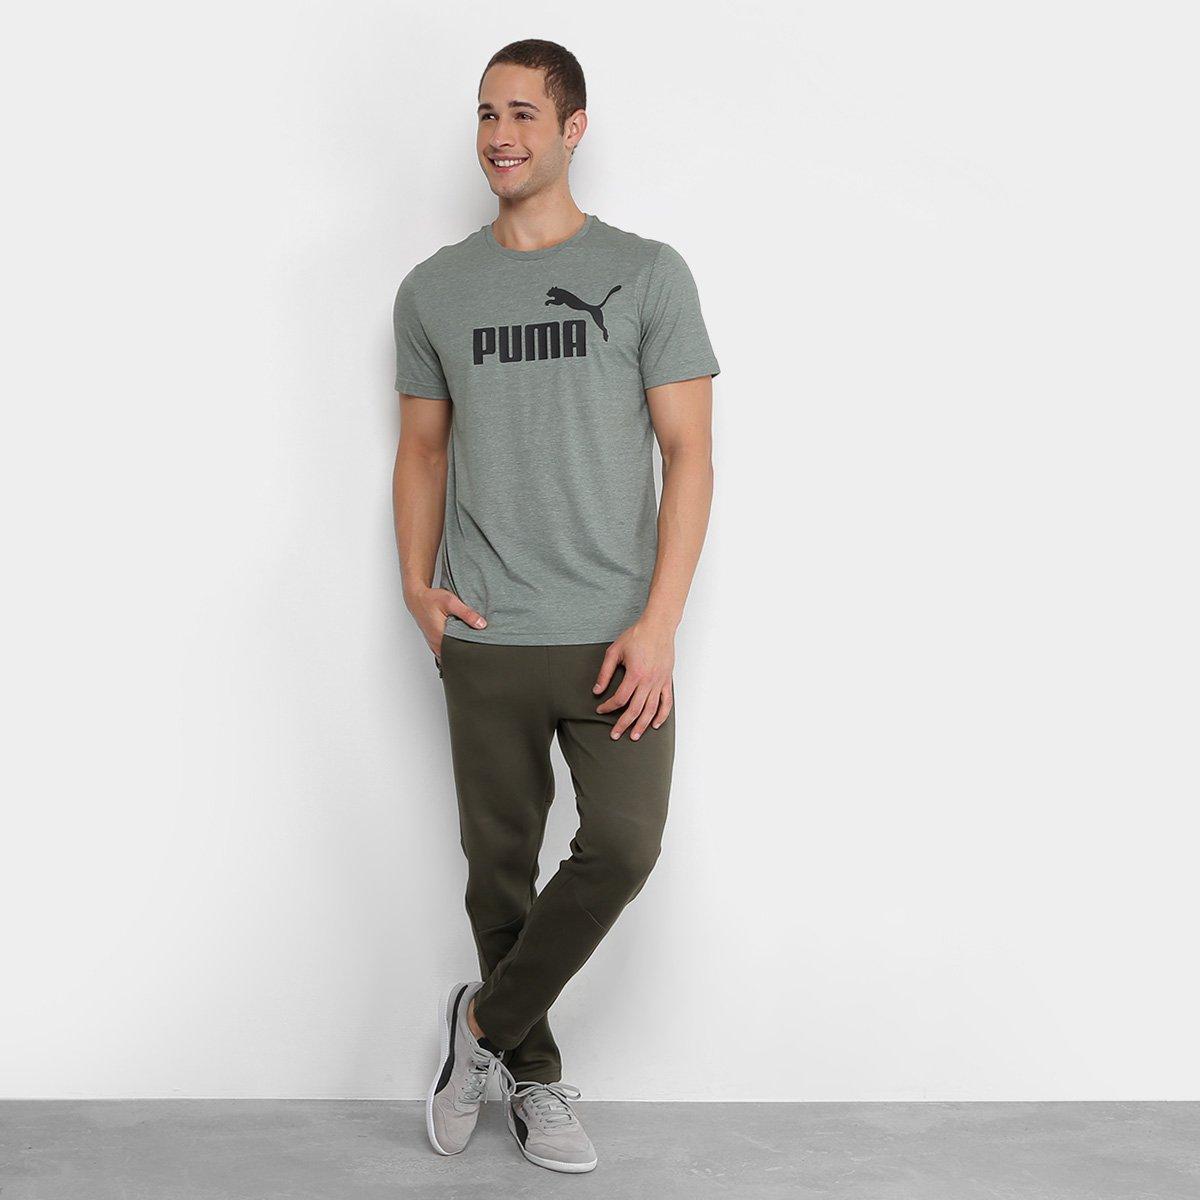 f112be7cdd Camiseta Puma Heather Masculina - Verde - Compre Agora